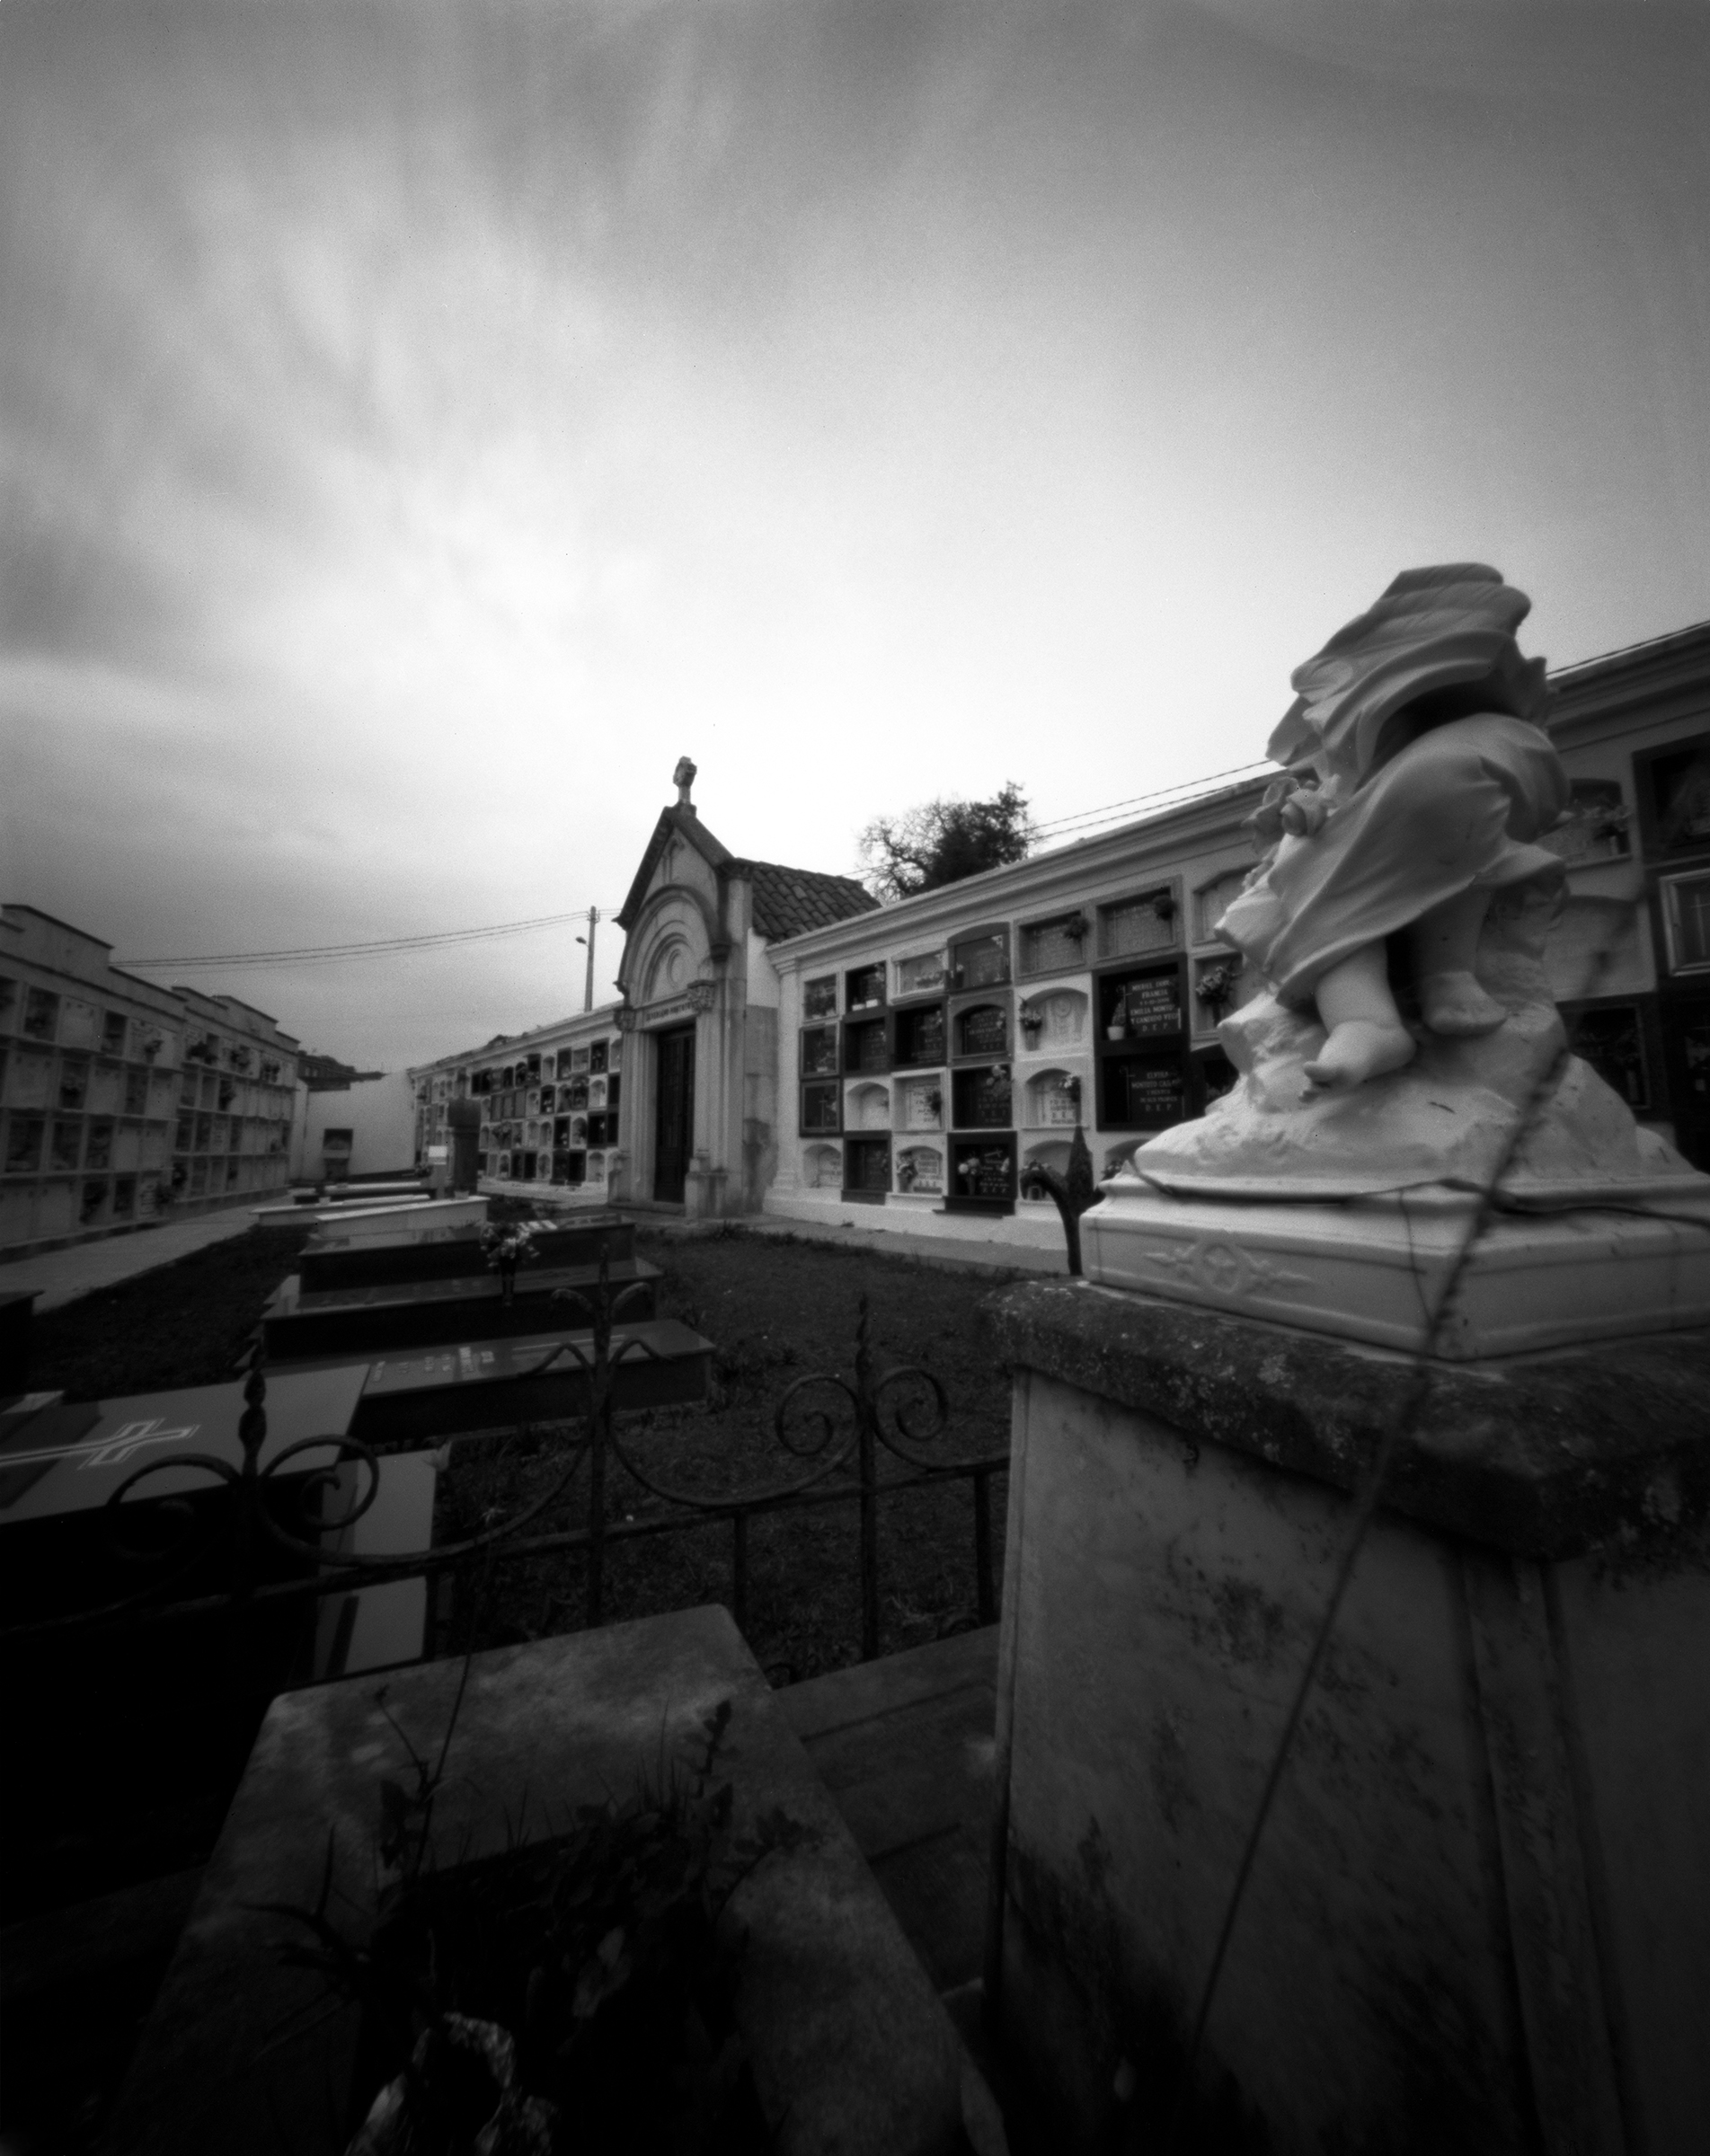 Cemetery of Lastres - Asturias, Spain - Fomapan 200 ASA in a Zero image 45 pinhole camera